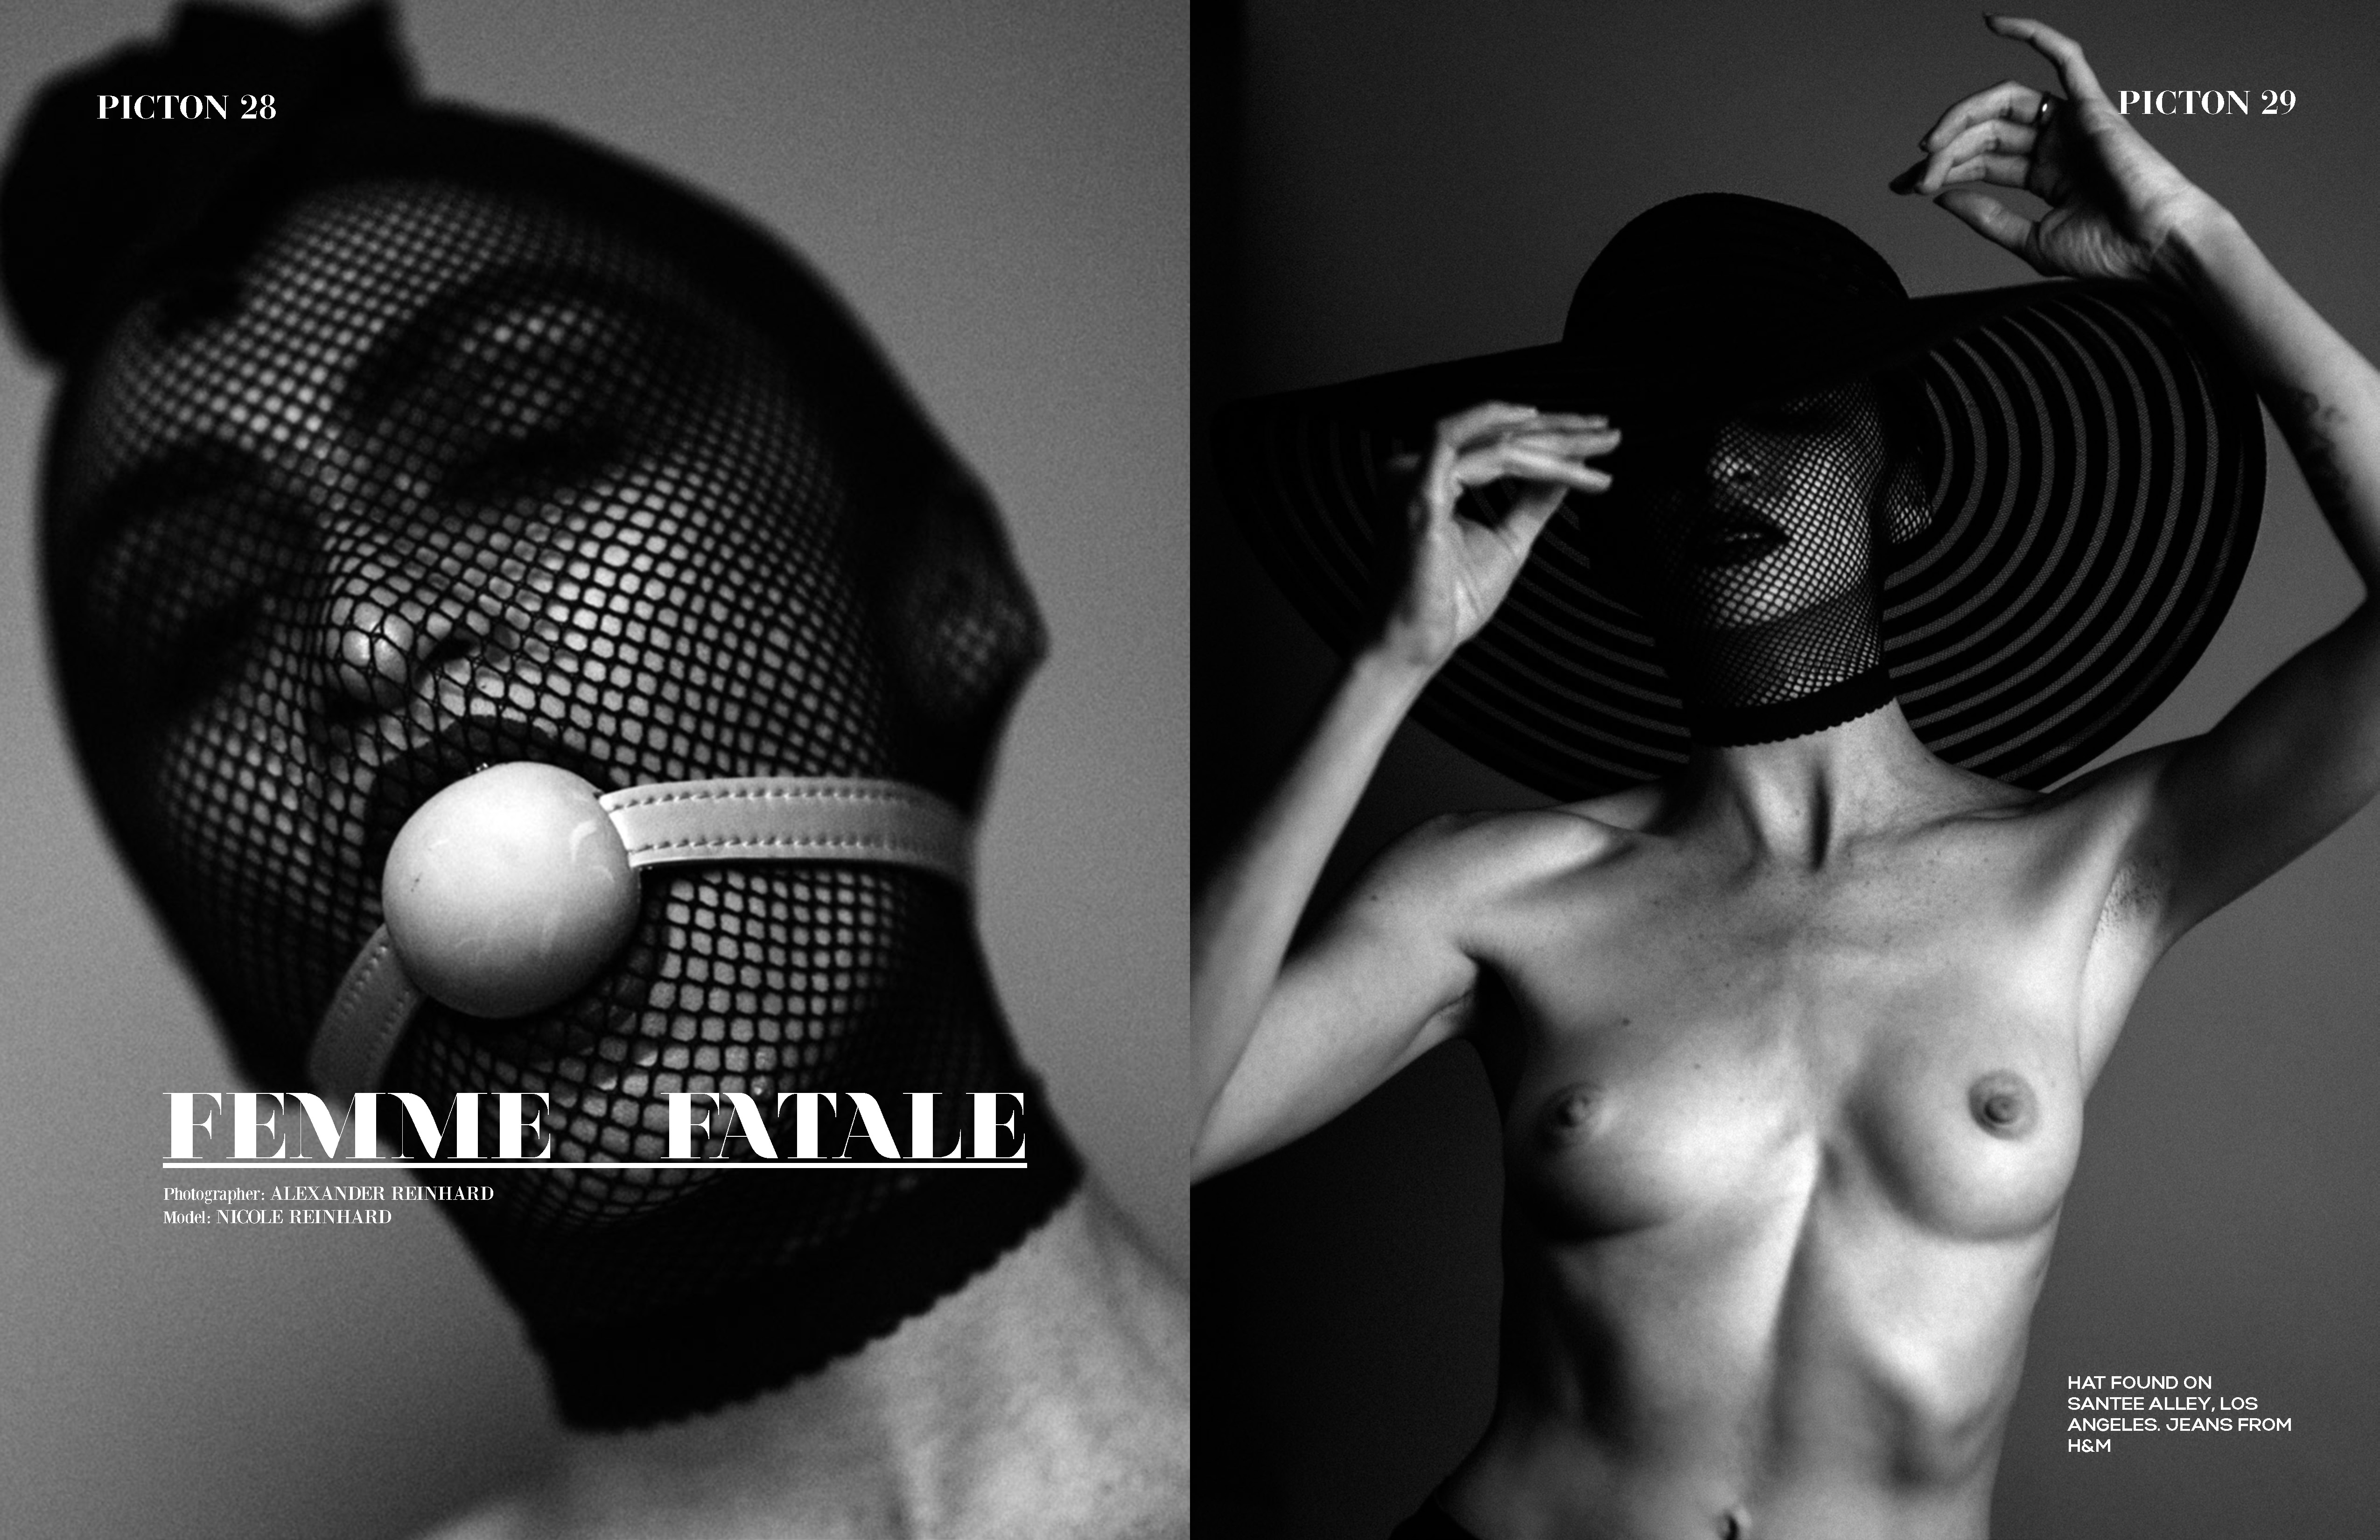 Femme Fatale (Picton Magazine No 253 Cover)